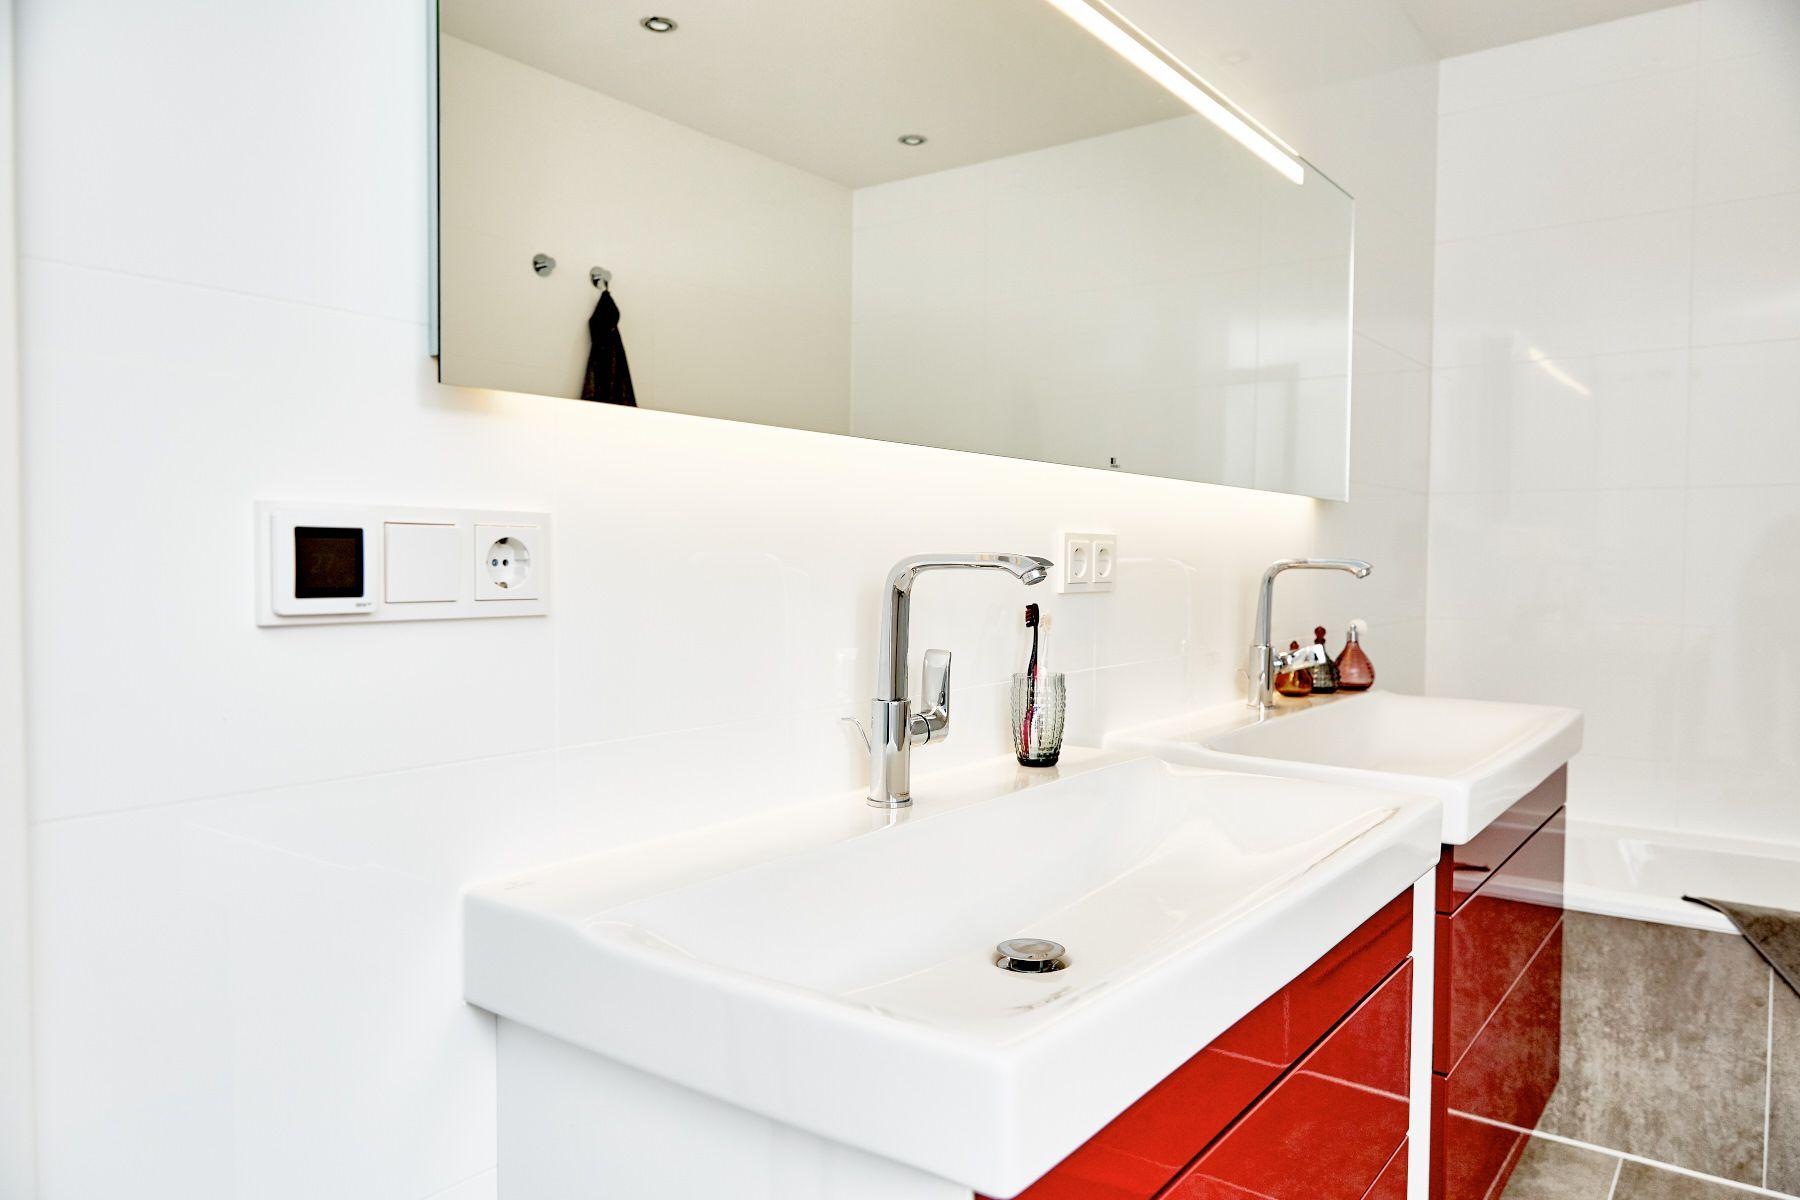 heibad #hansgrohe #bath #bathroom #architecture #keuco #accessoires ...